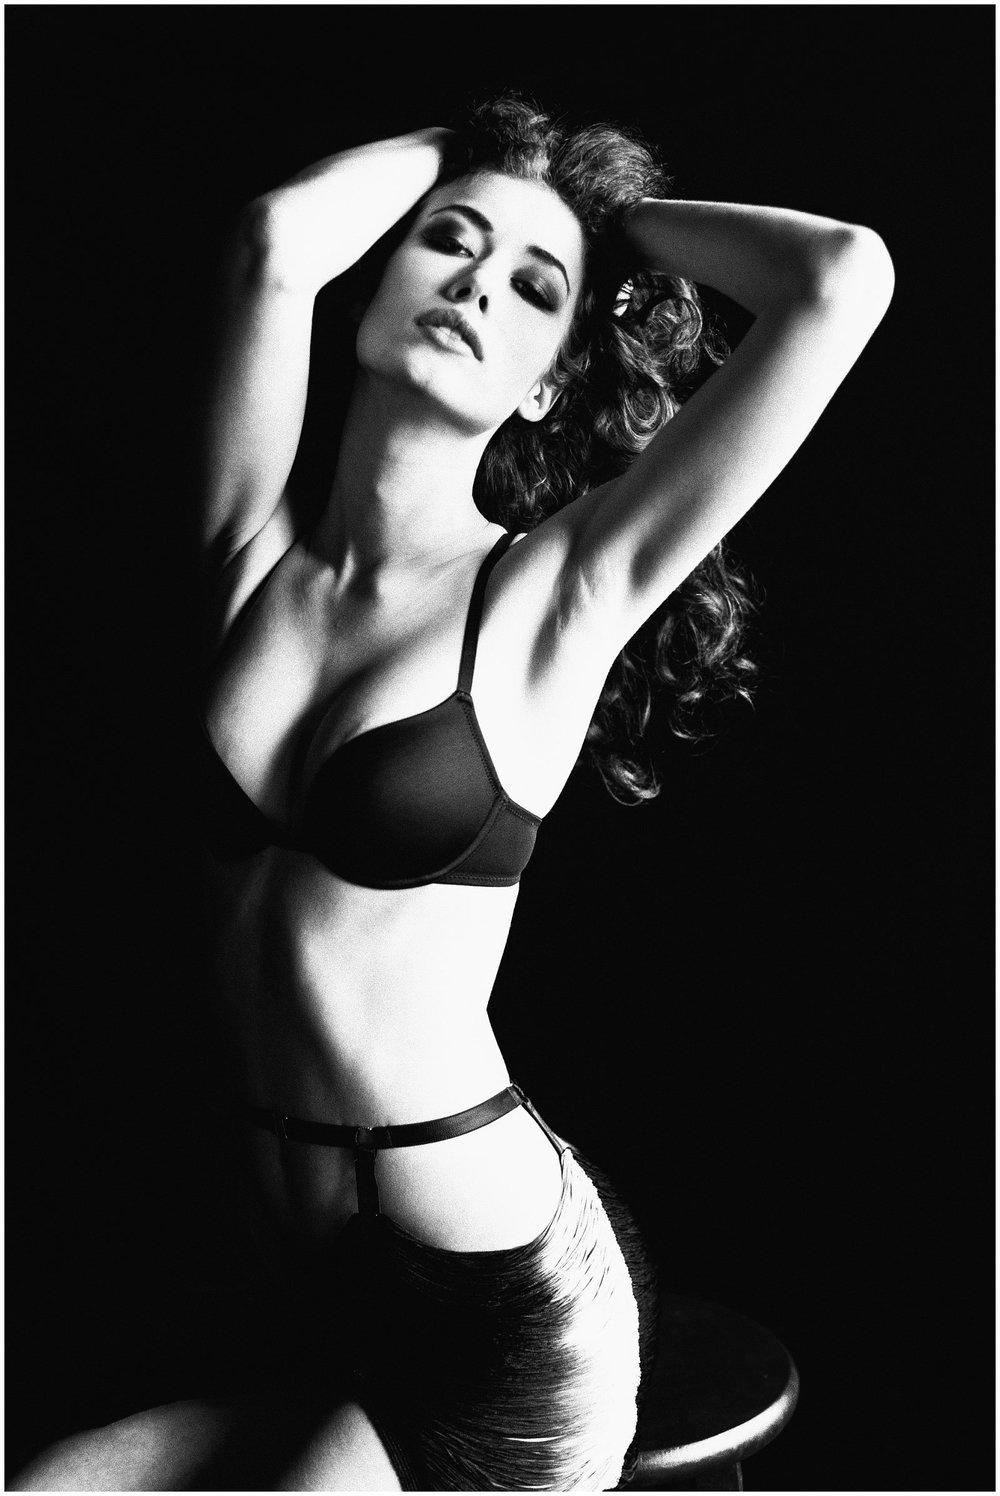 Modern-Love-Photography-Studio_3479.jpg